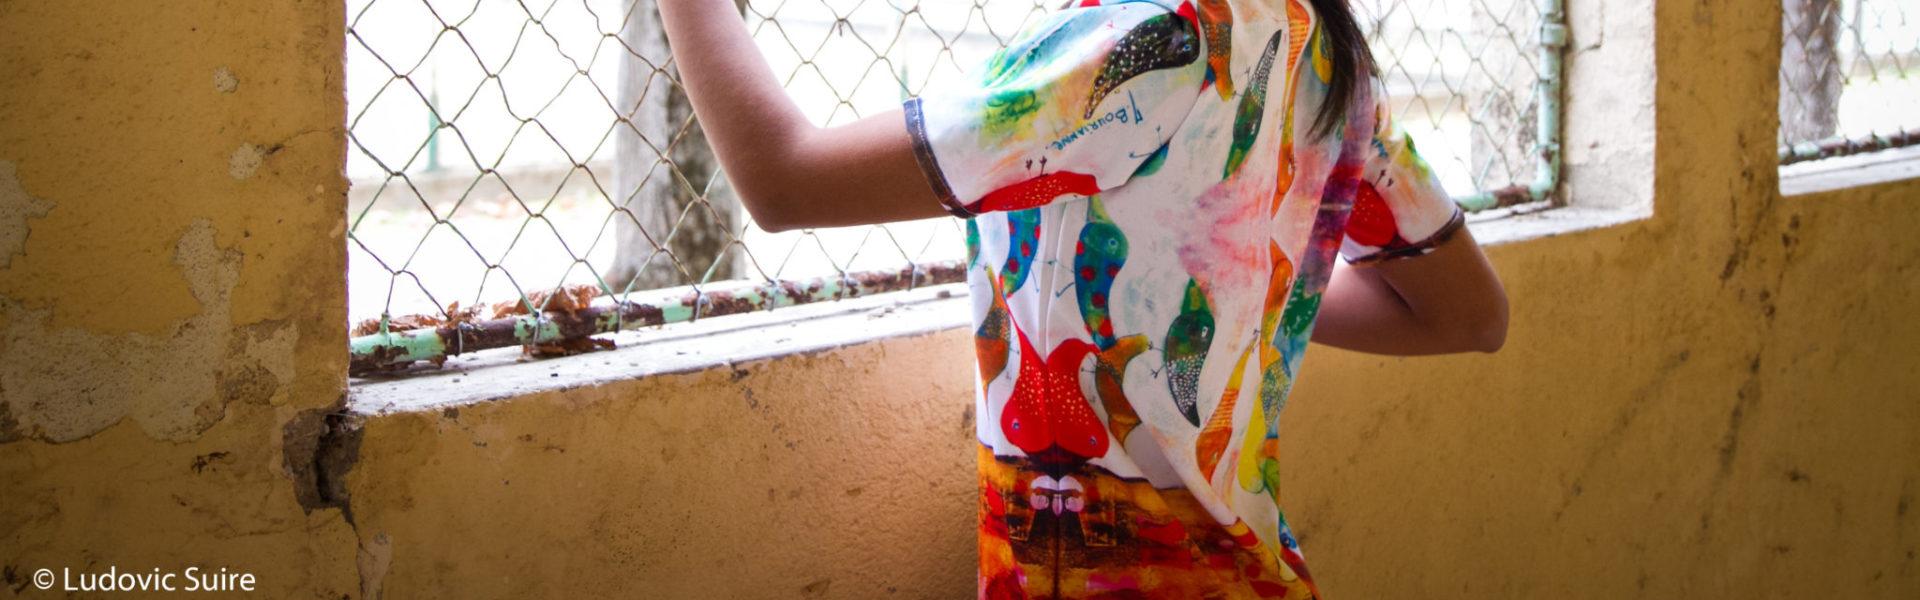 Aurya, prêt-à-porter féminin et made in France